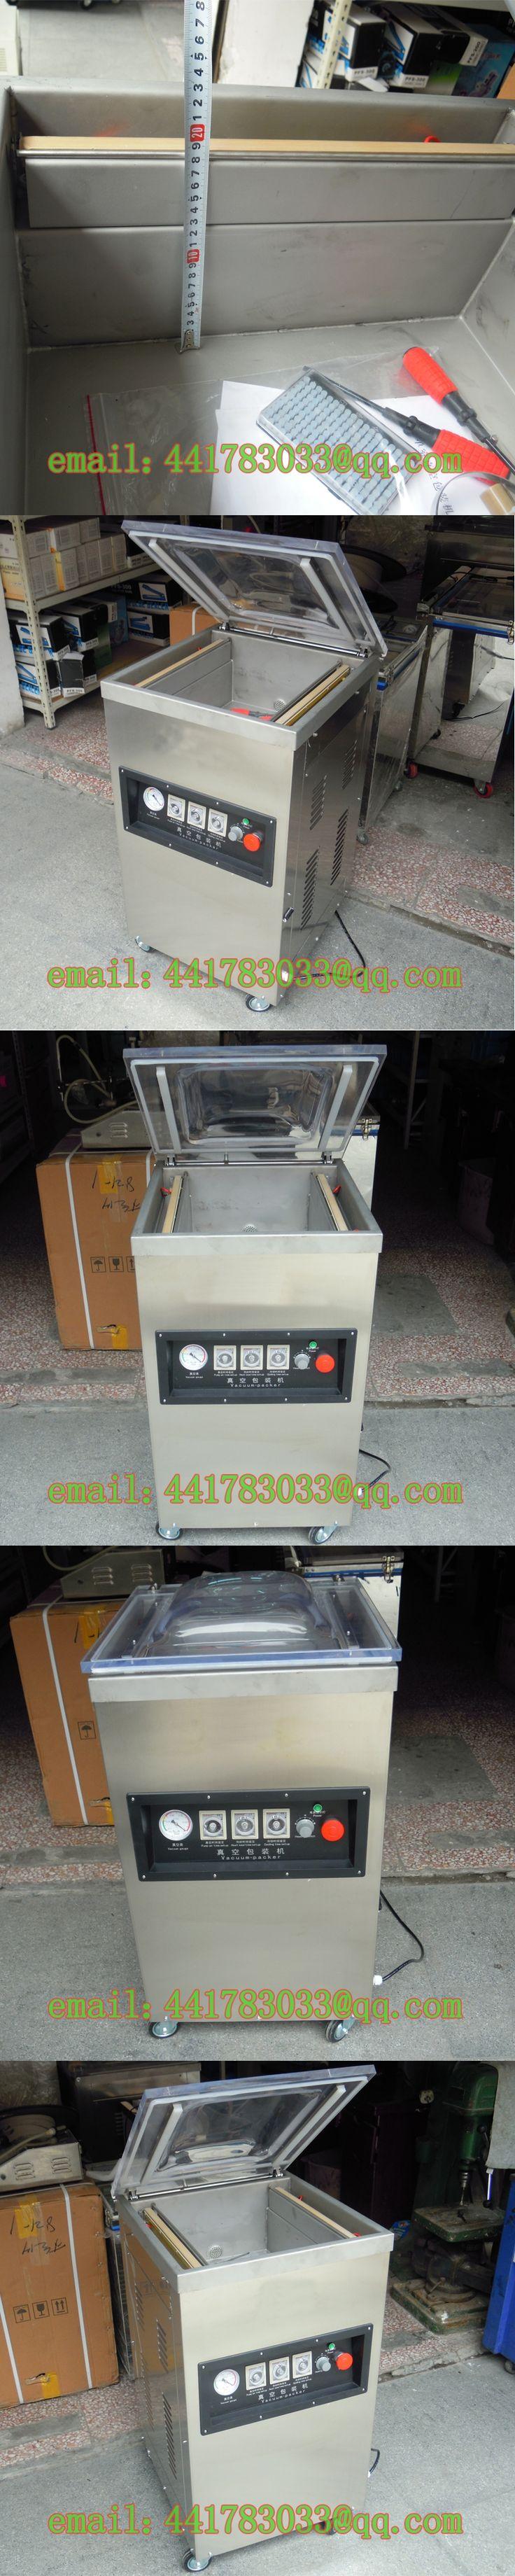 DZQ-500 / 2ES single-chamber vacuum machine deepen  Single-chamber vacuum packaging machine Poultry vacuum packaging machine